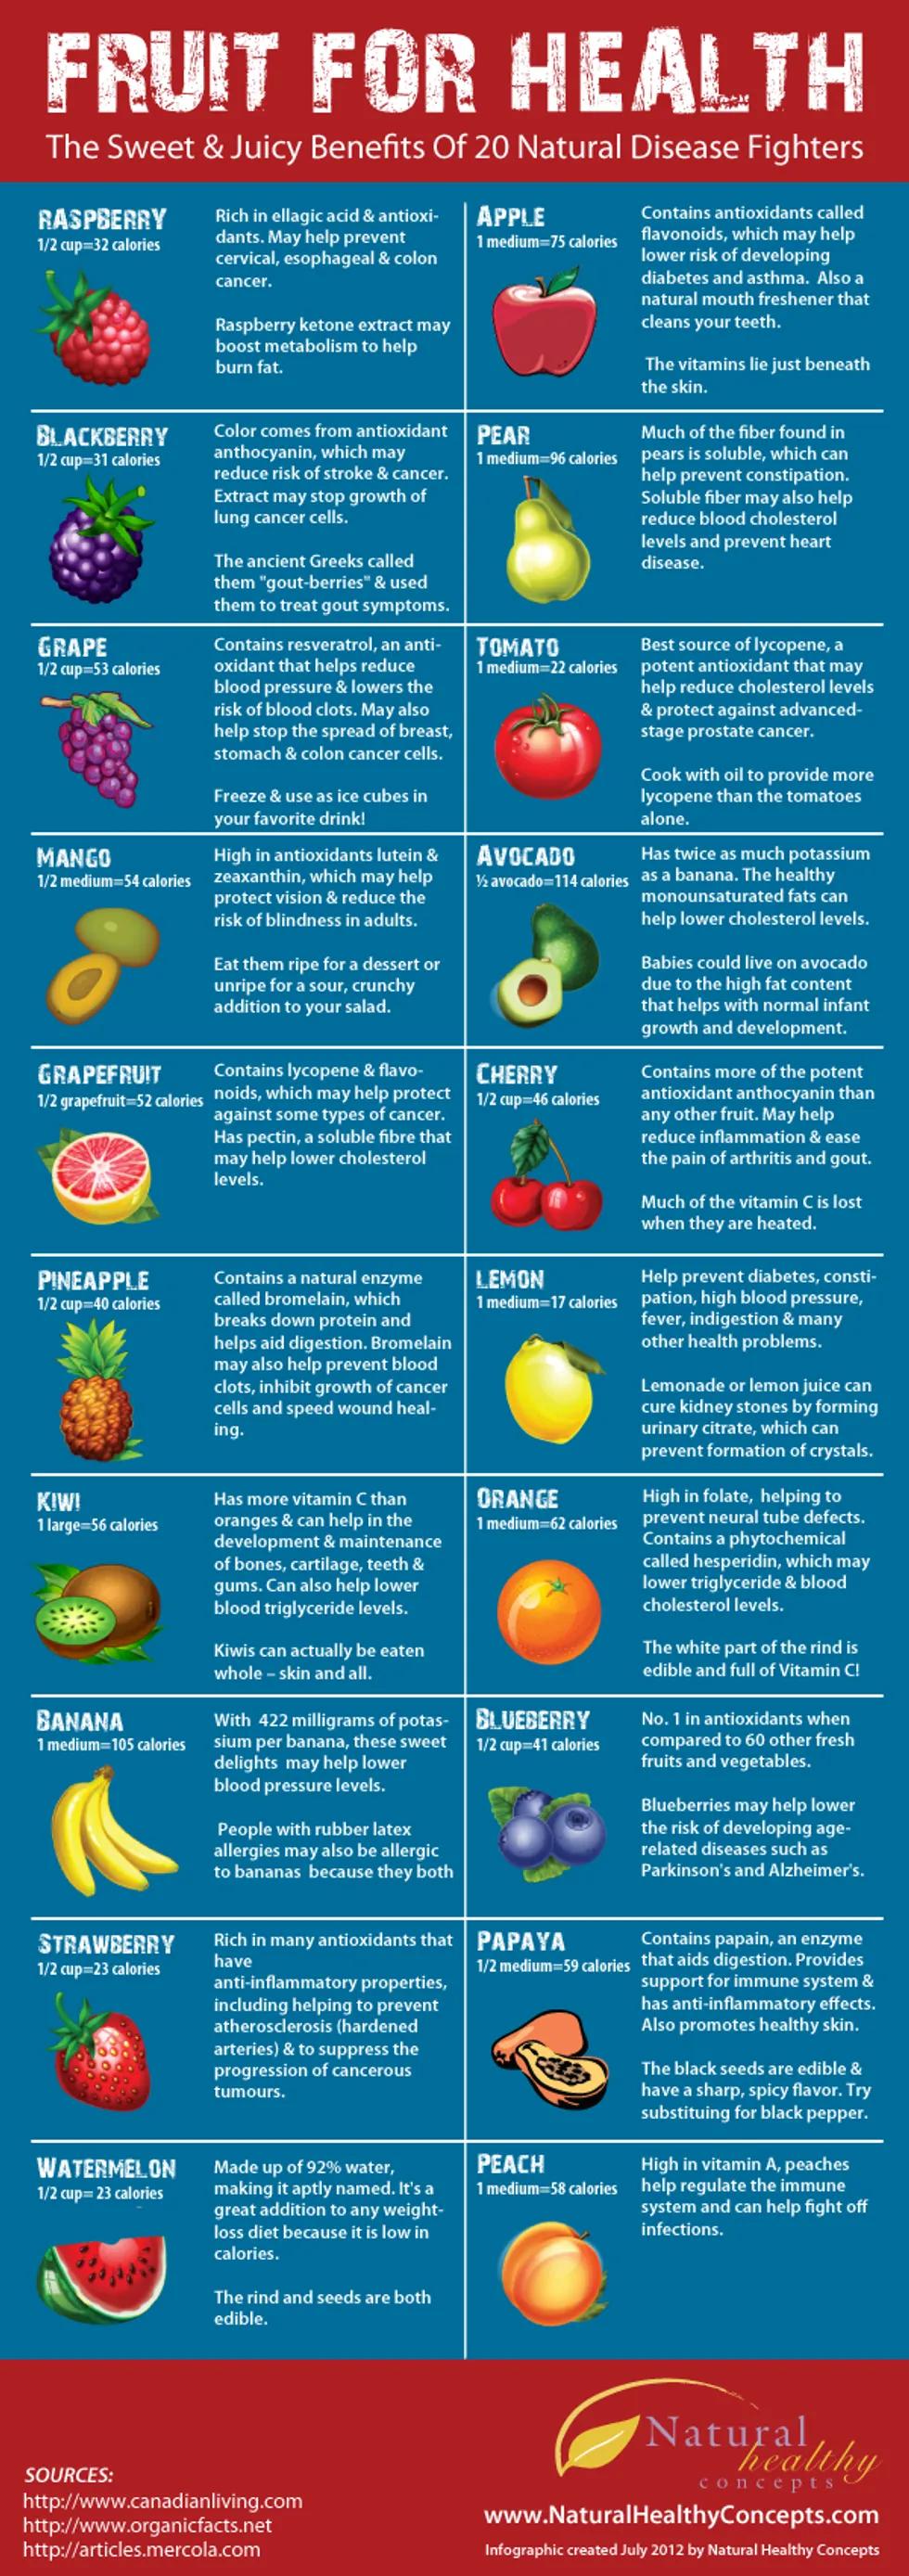 The Disease Fighting Benefits Of Fruit